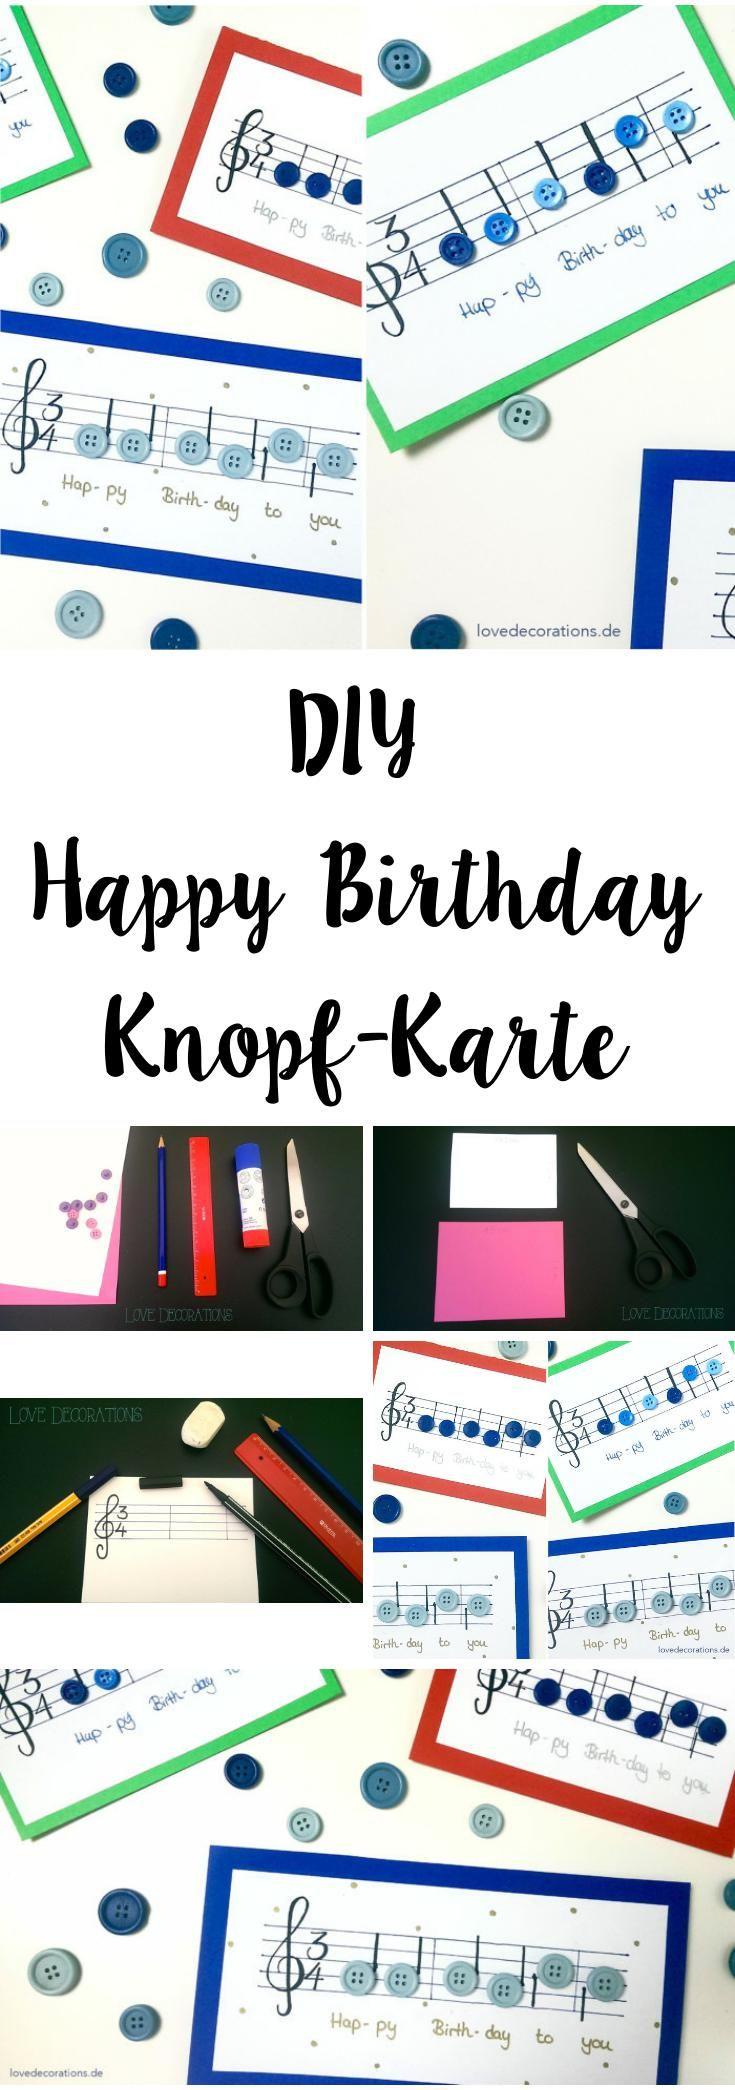 DIY Happy Birthday Button Card   DIY Happy Birthday Knopf-Karte